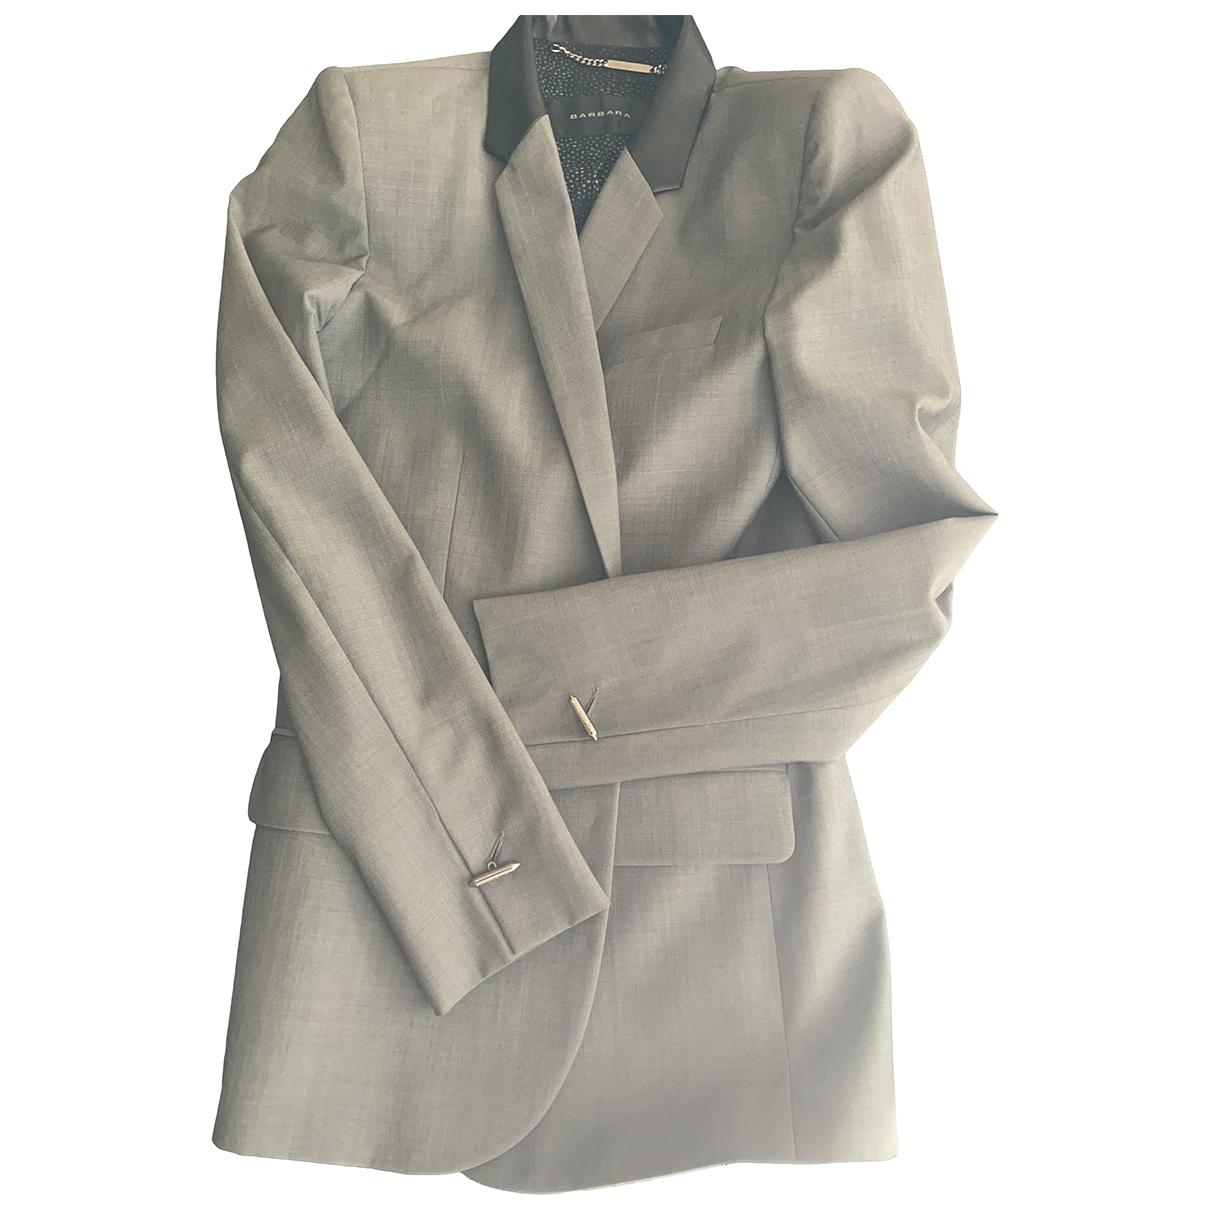 Barbara Bui \N Grey Cotton jacket for Women 38 FR